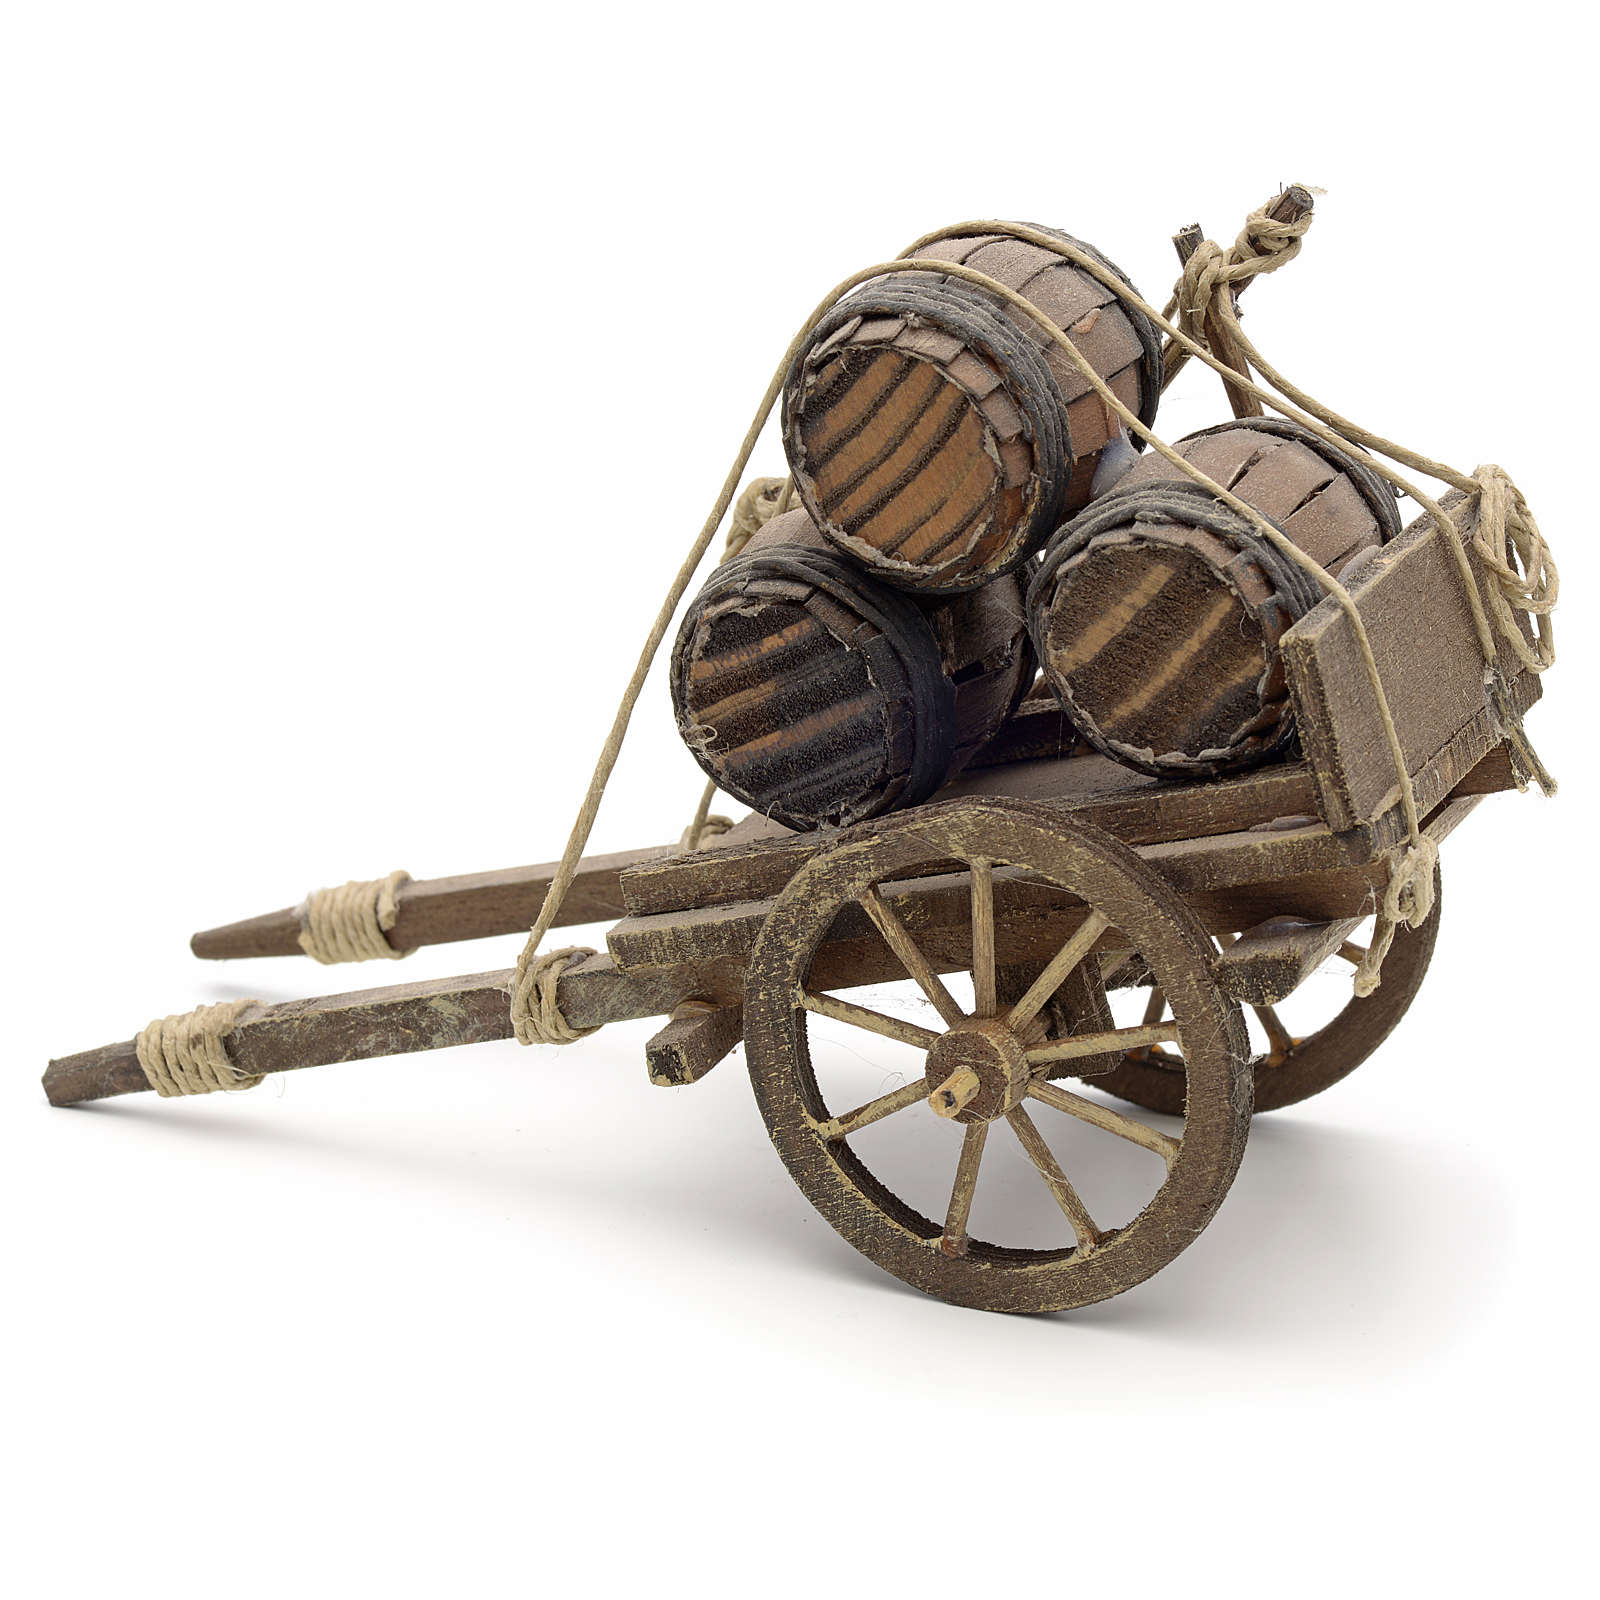 Neapolitan Nativity scene accessory, cart with casks 4